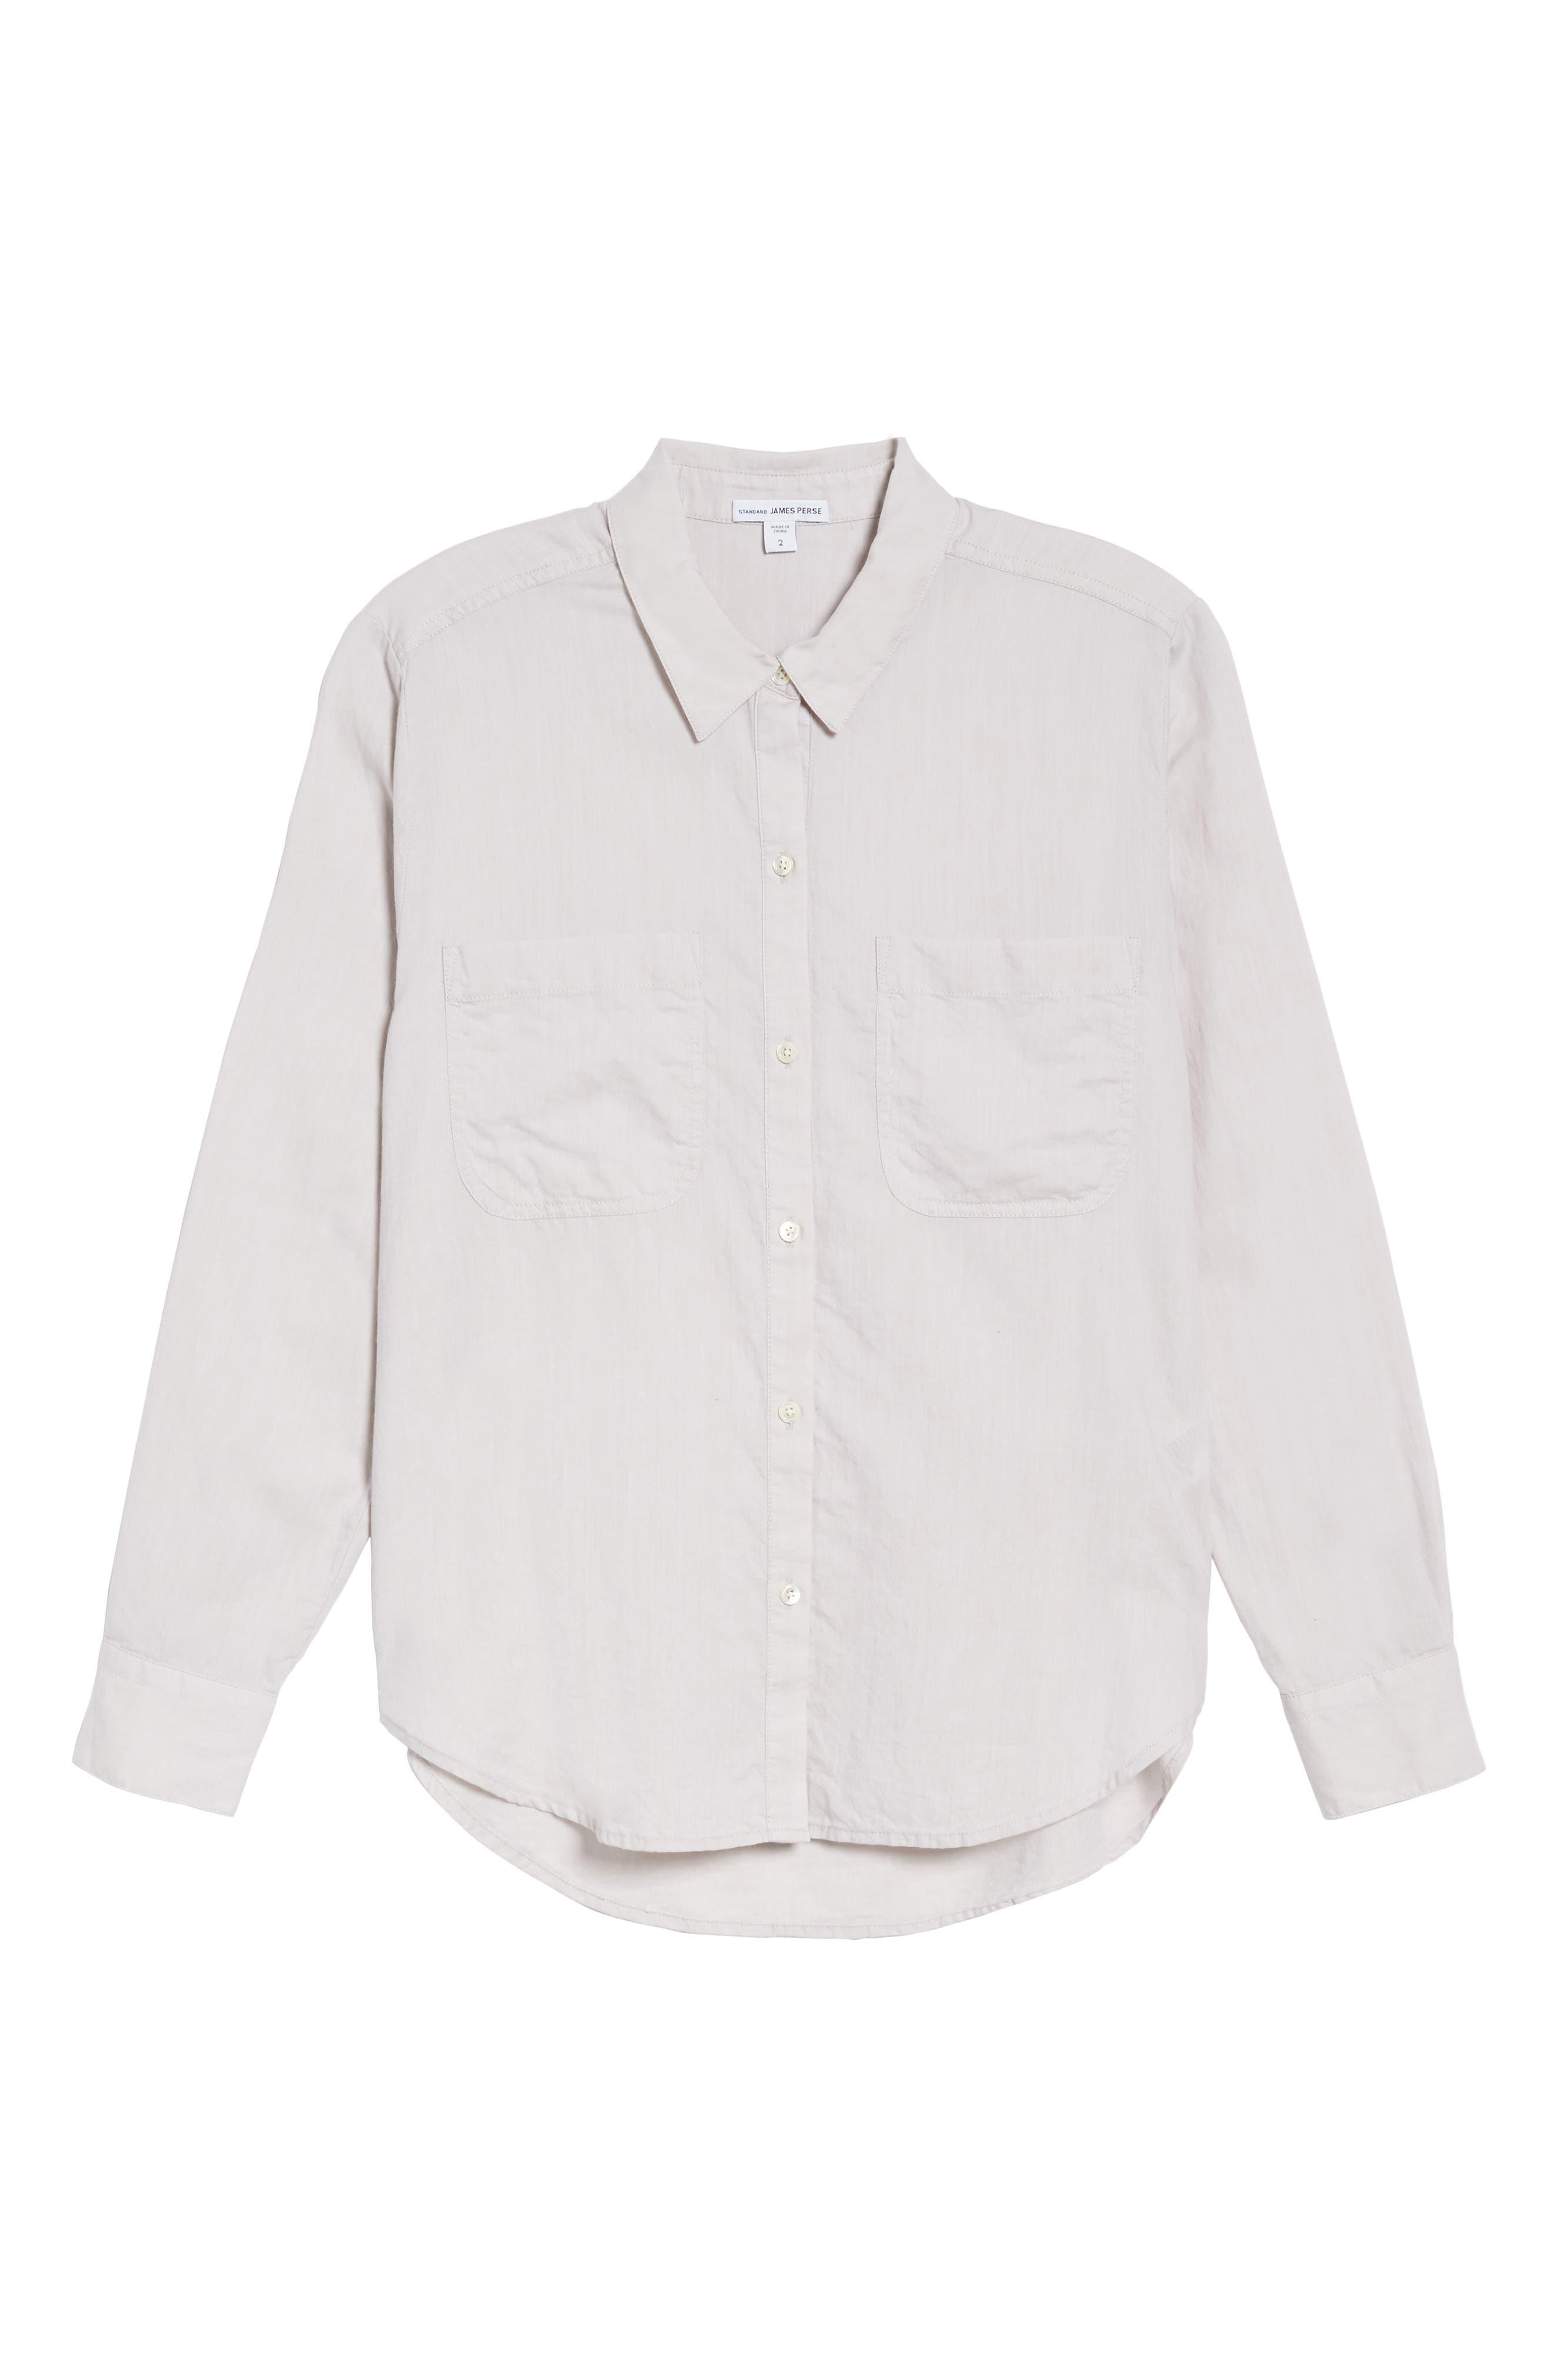 Little Boy Shirt,                             Alternate thumbnail 6, color,                             026